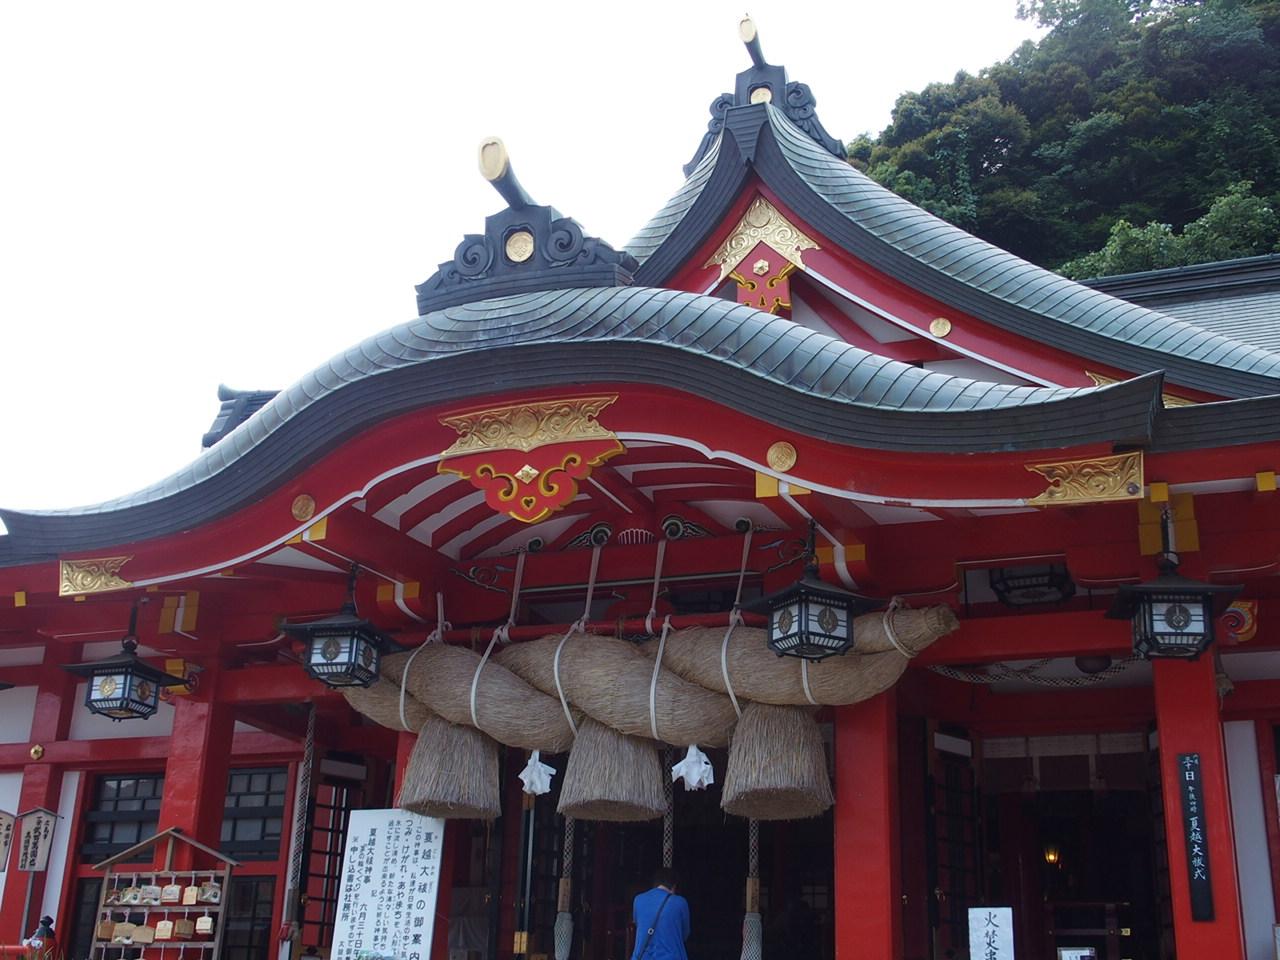 津和野の太鼓谷稲成神社